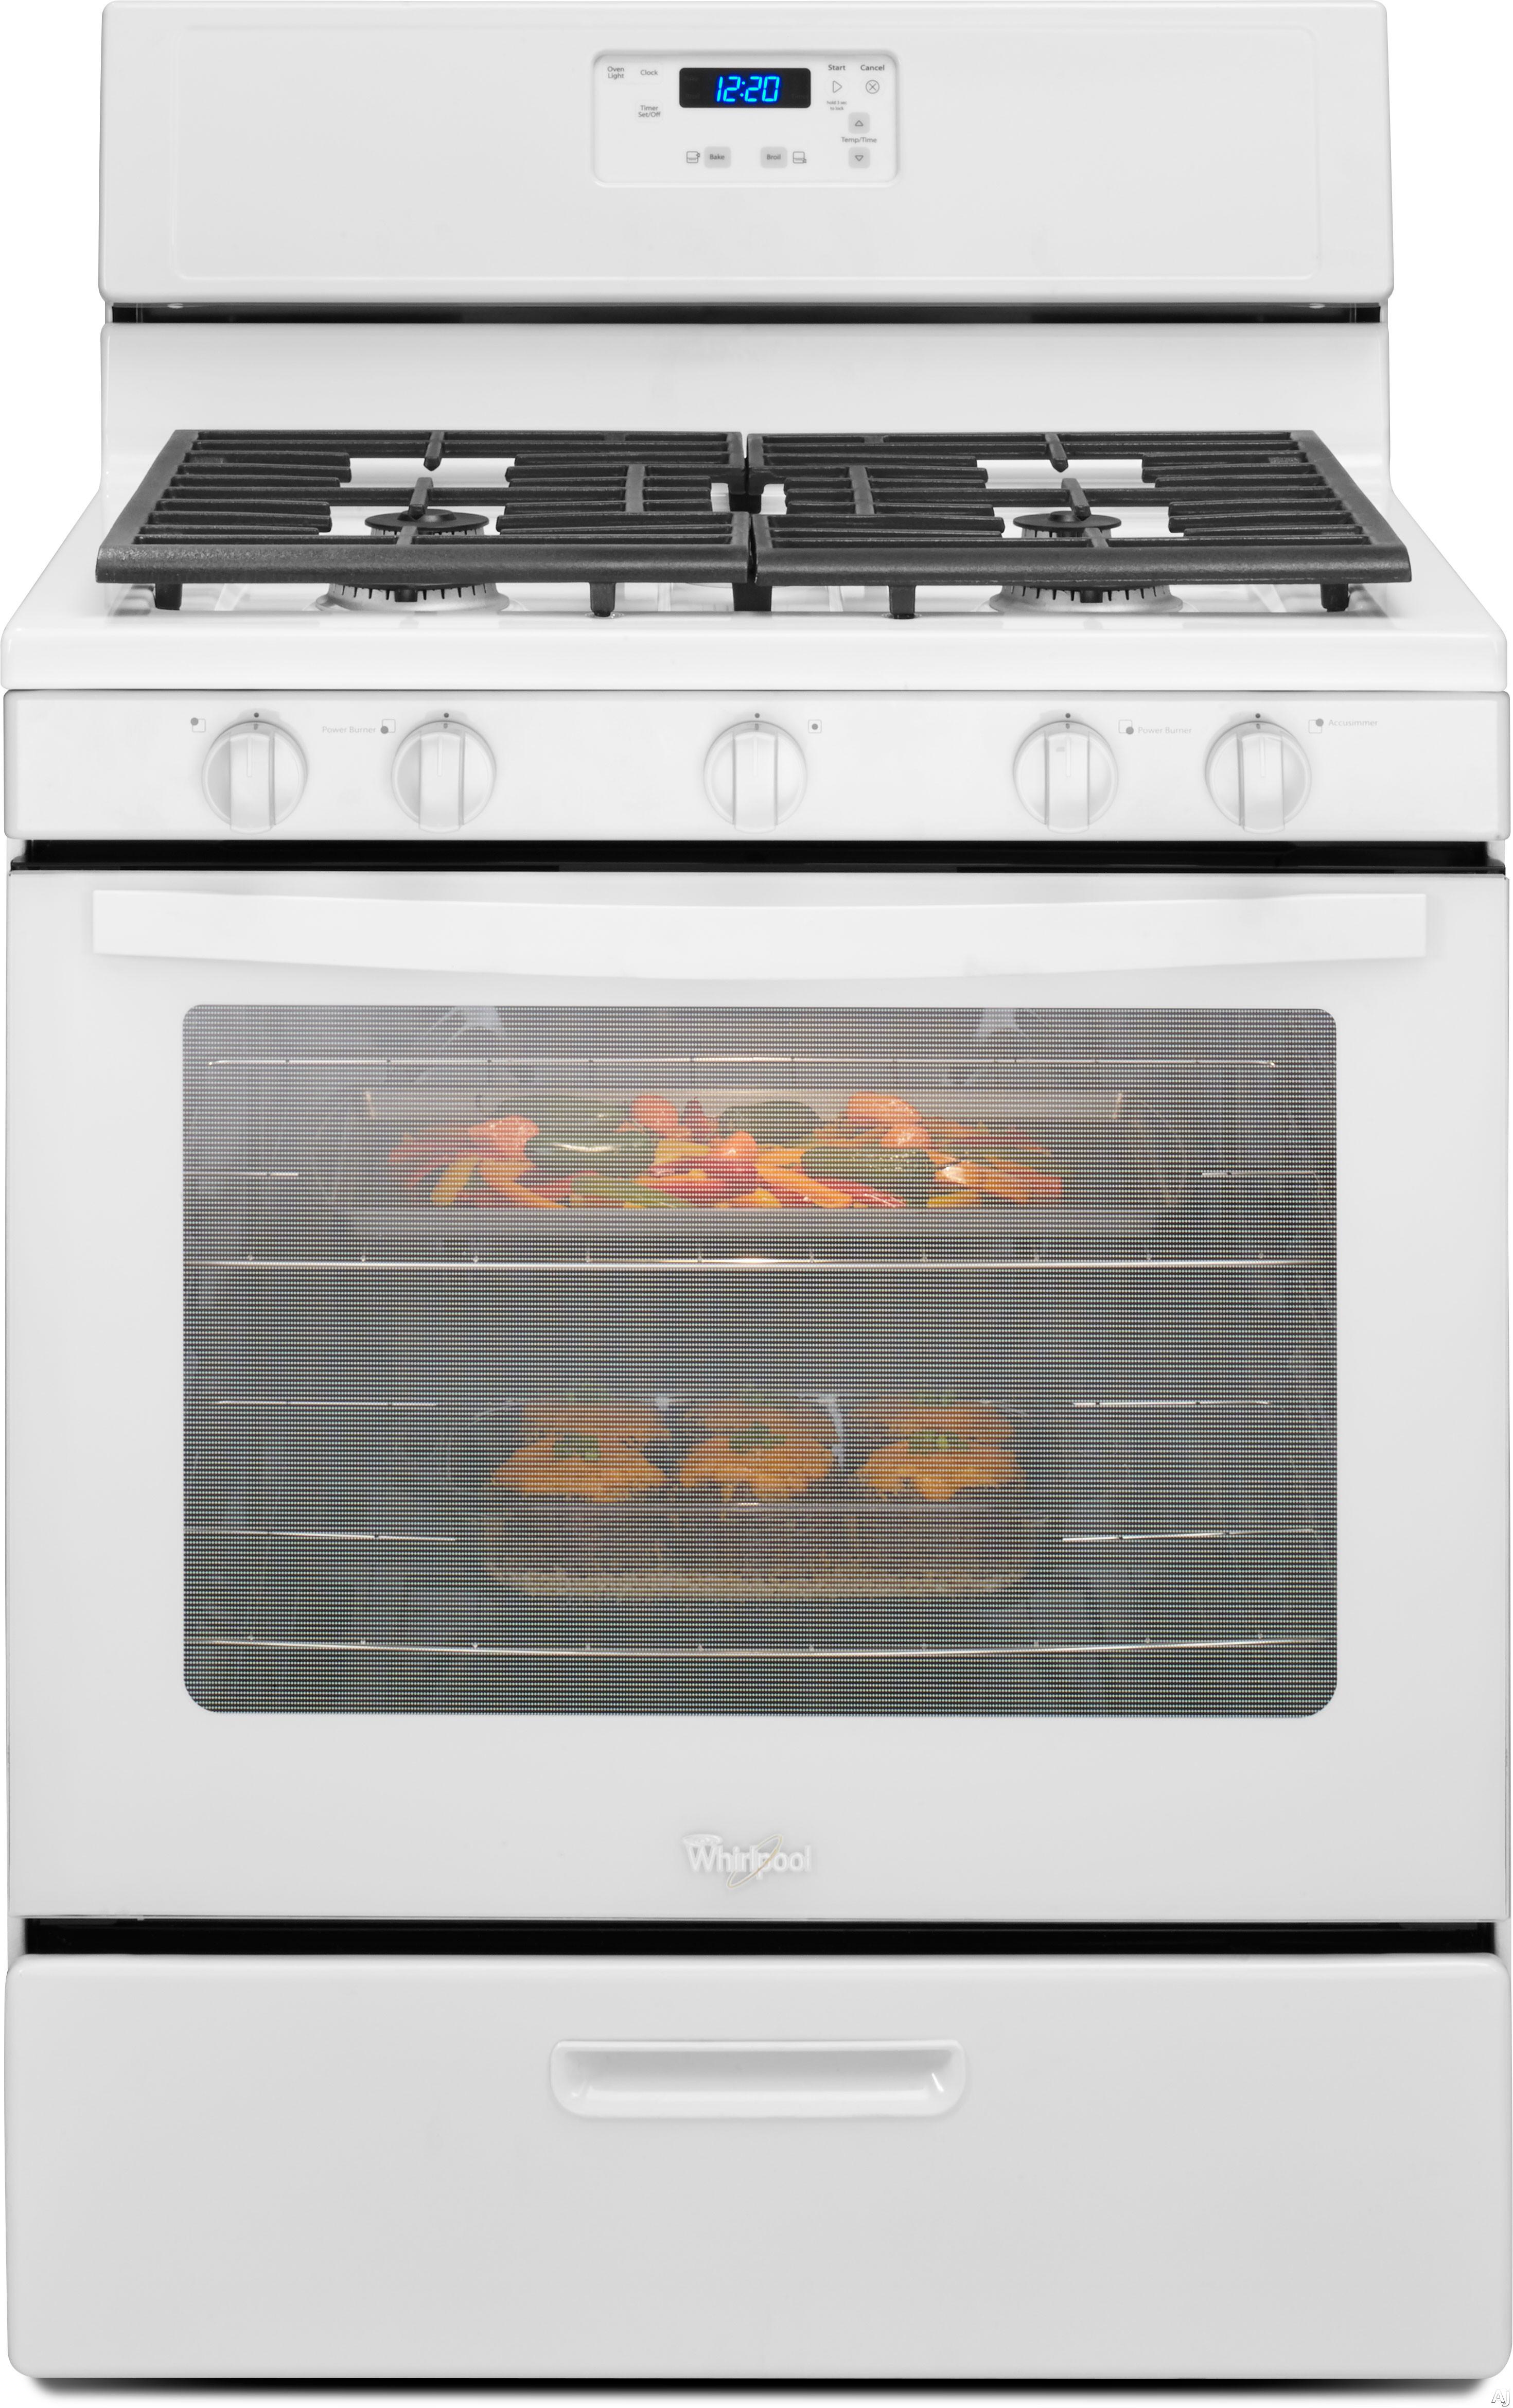 Whirlpool 5 burner gas range - Upc 883049290324 Product Image For 5 1 Cu Ft Gas Range In White Upcitemdb